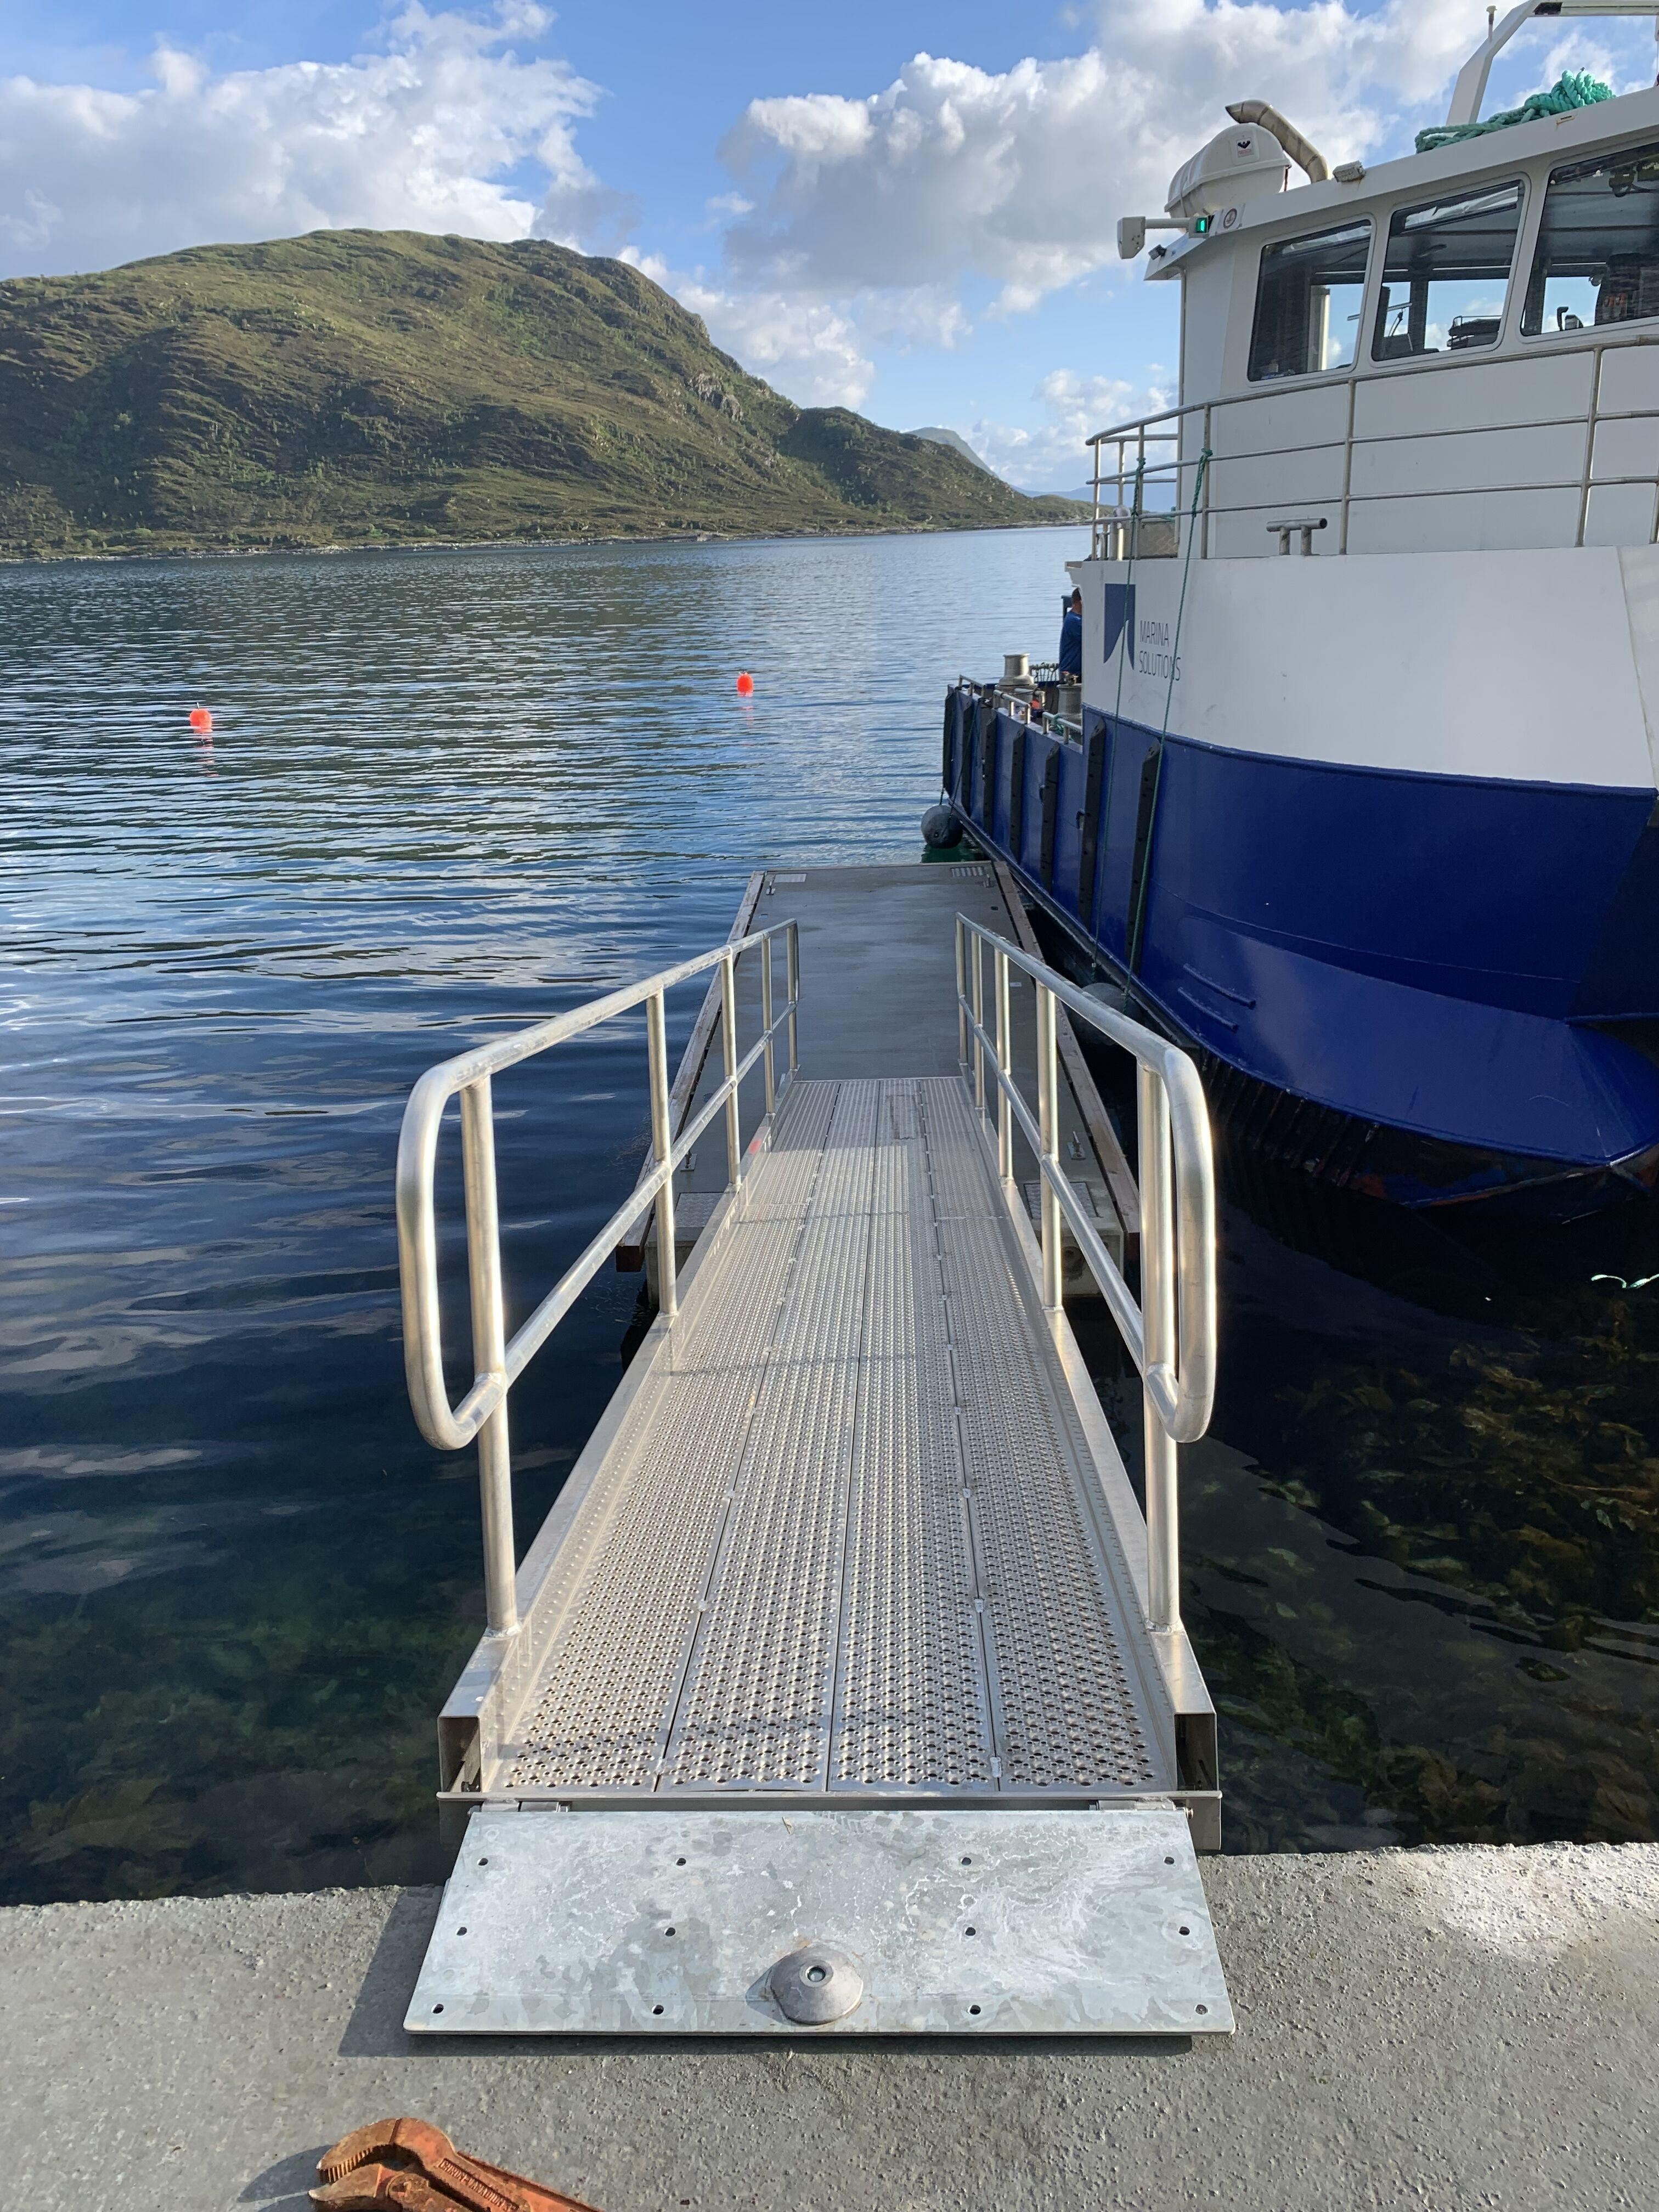 https://marinasolutions.no/uploads/Haugsbygda-Gursken-Larsnes-landstedsbrygge-Marina-Ocean-landgang.jpeg